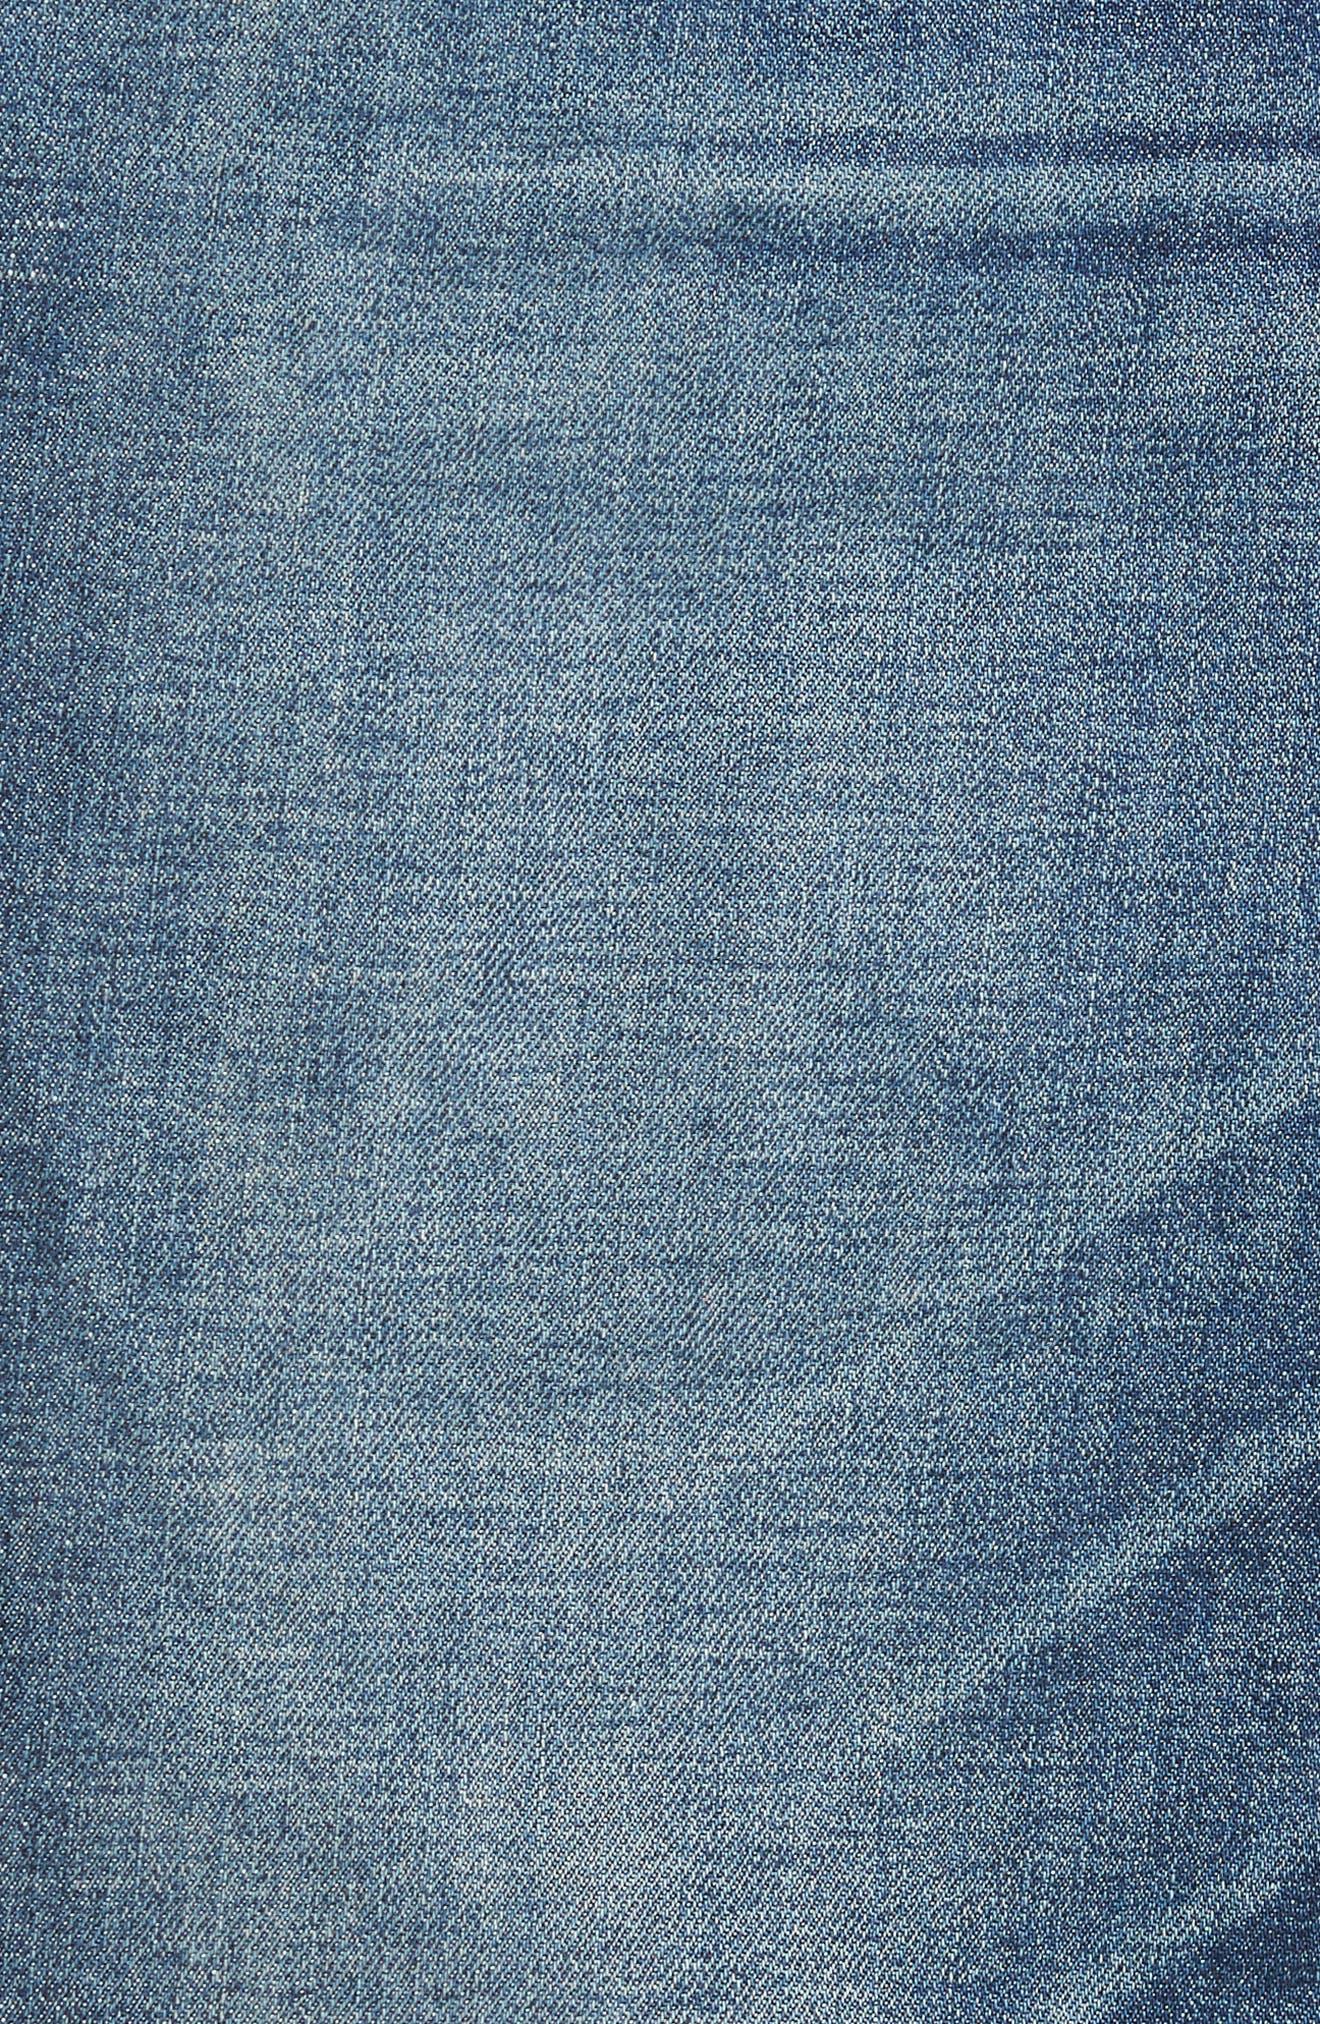 HUDSON JEANS,                             Vaughn Biker Skinny Fit Jeans,                             Alternate thumbnail 5, color,                             422